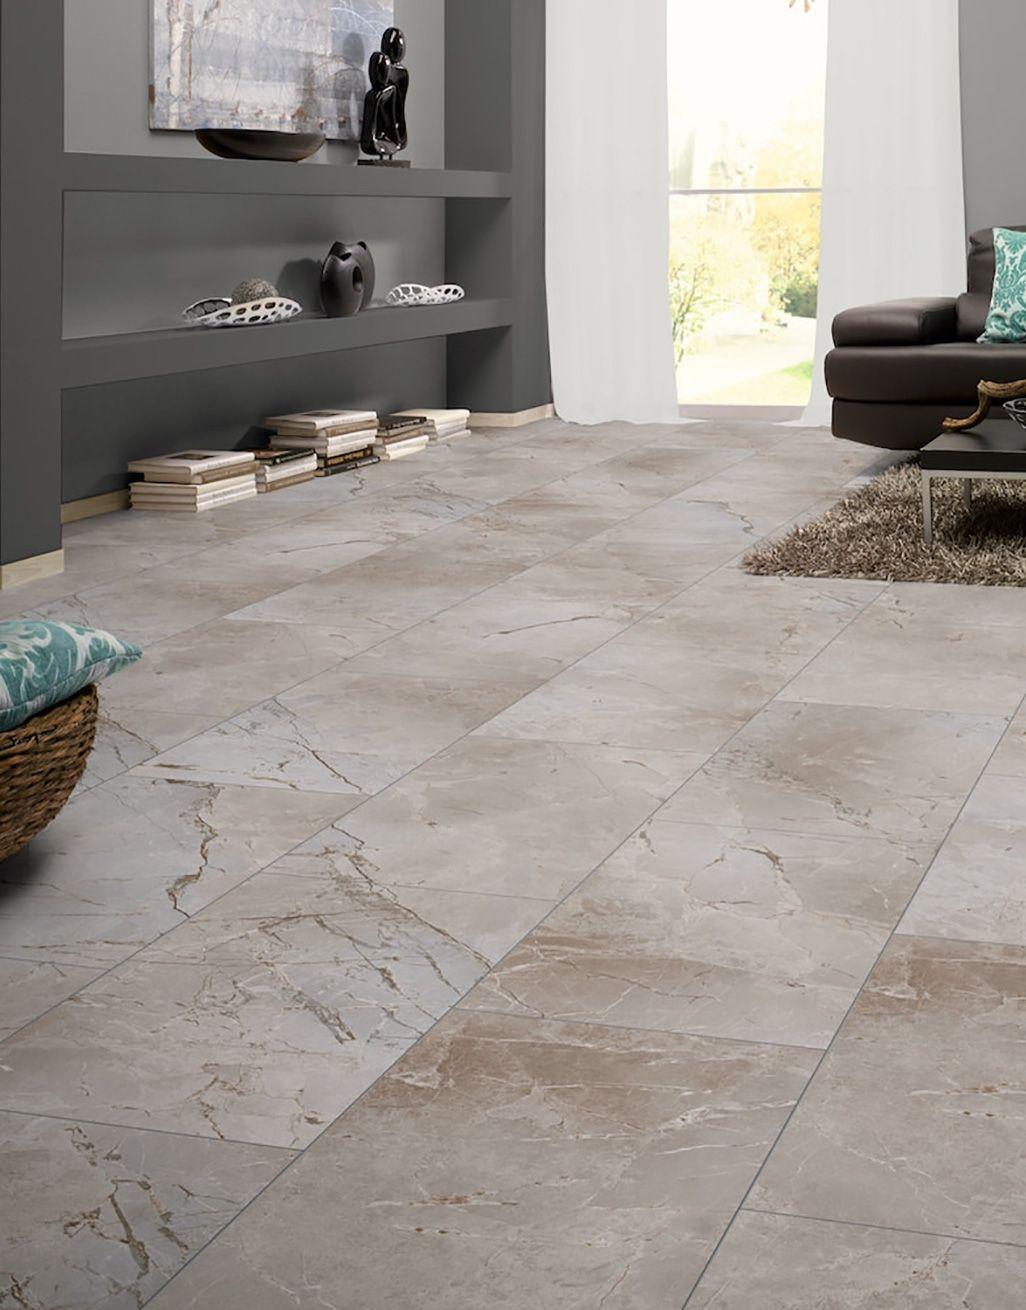 Verona Tile - Light Grey Marble Laminate Flooring in 2020 ...